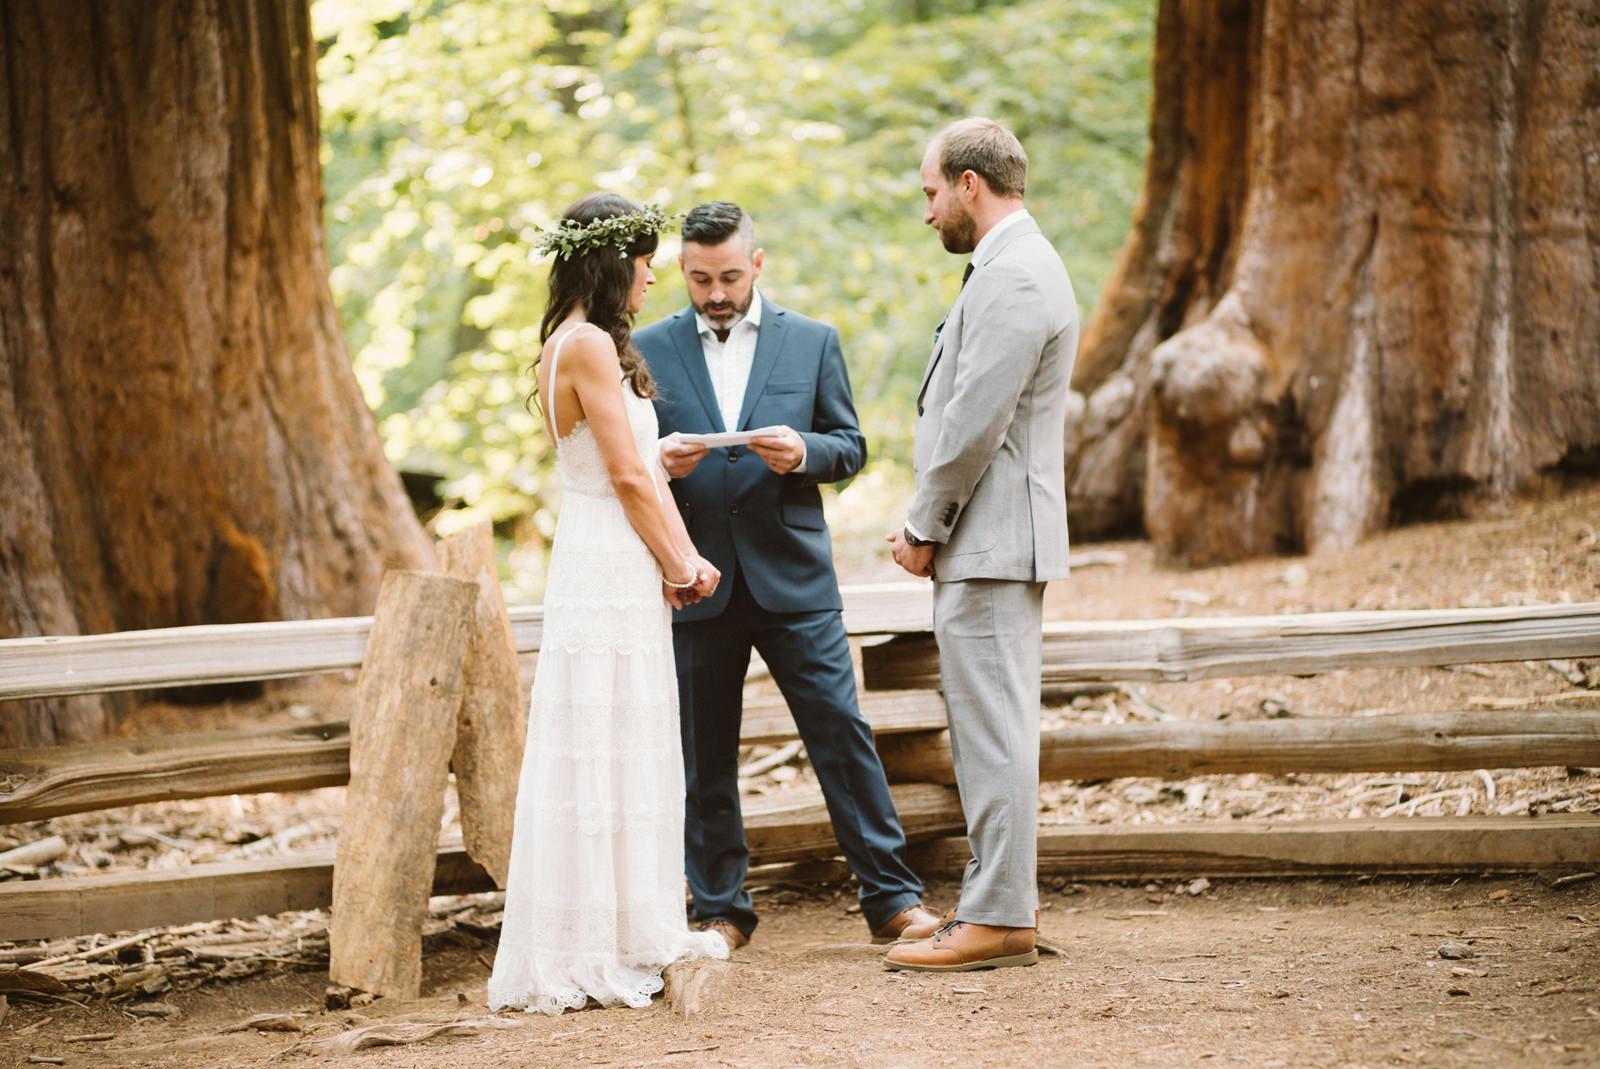 yosemite-intimate-wedding-055 YOSEMITE INTIMATE WEDDING